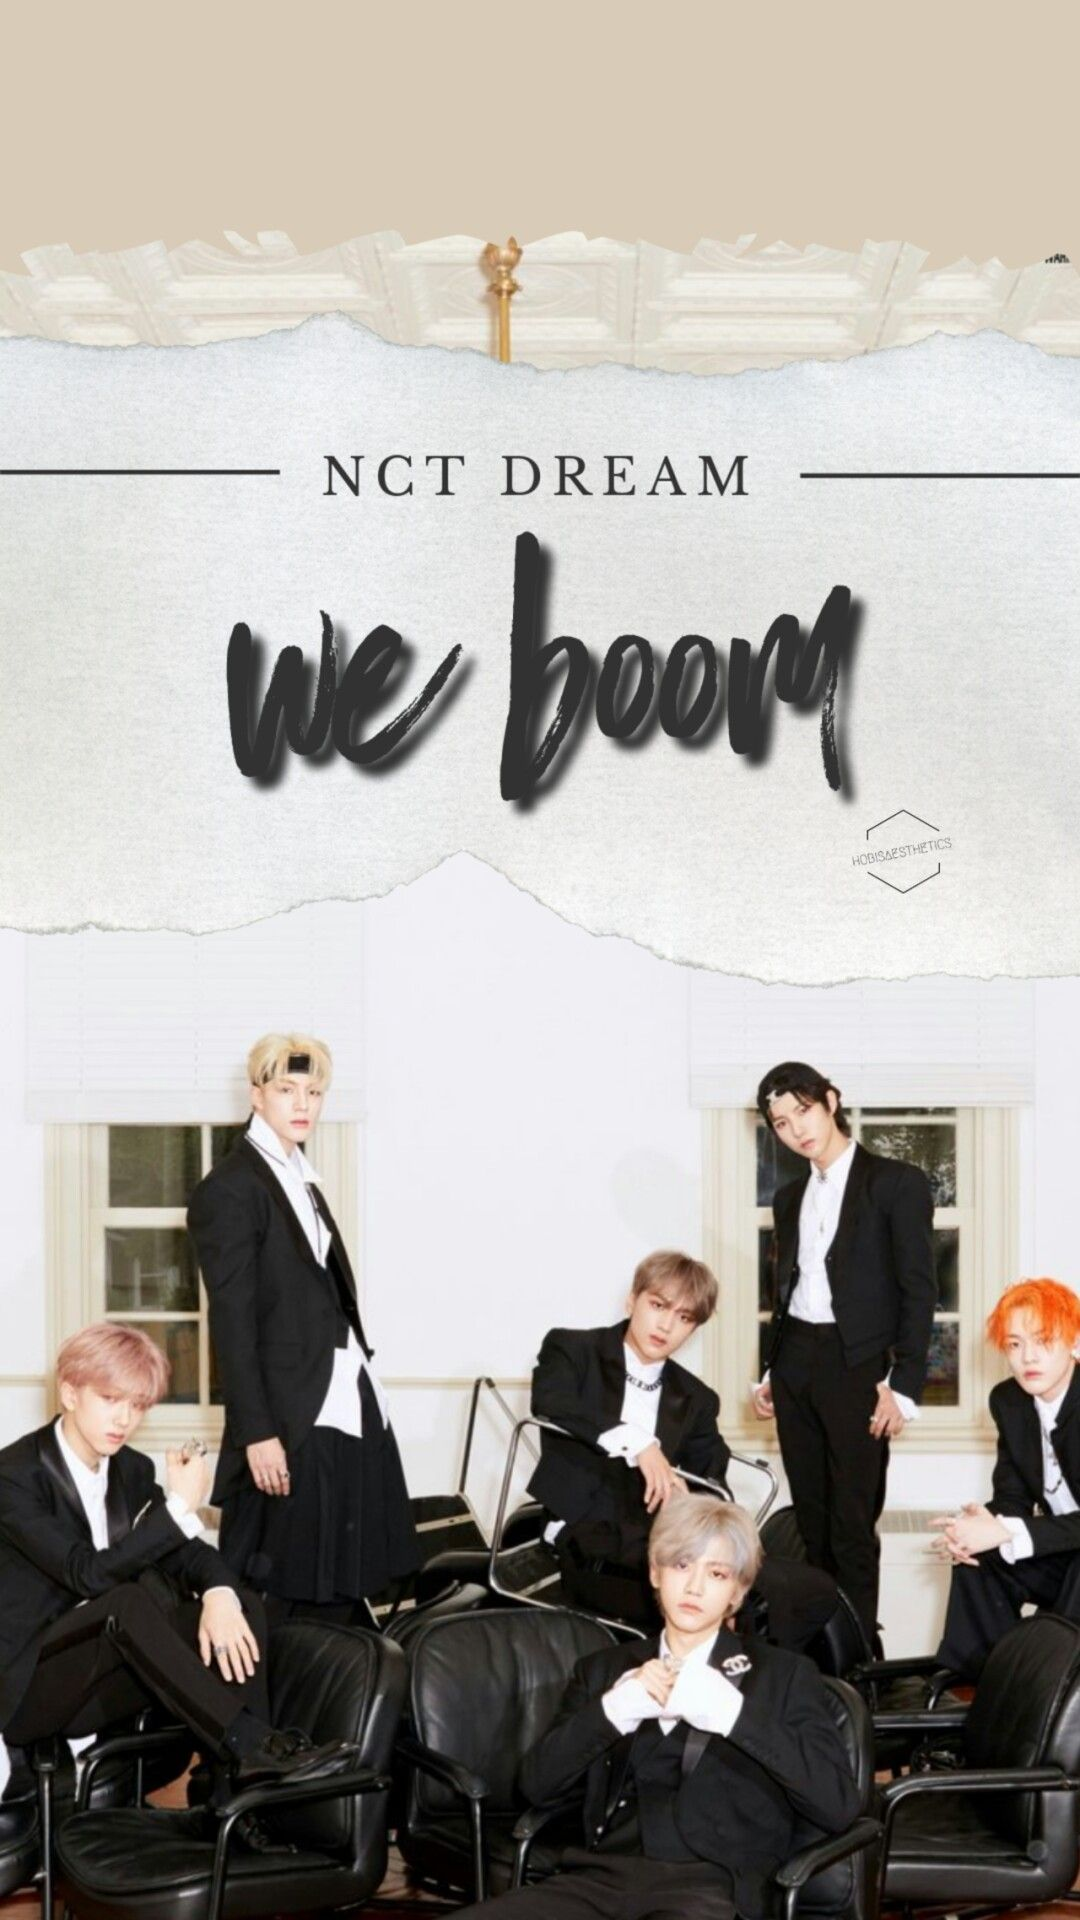 Nct Dream Mv Boom Wallpaper Lockscreen Hd Fondo De Pantalla Winwin Jisung Chenle Haechan Doyoung Yuta Taeil Jeno Luca Nct Selebritas Gambar